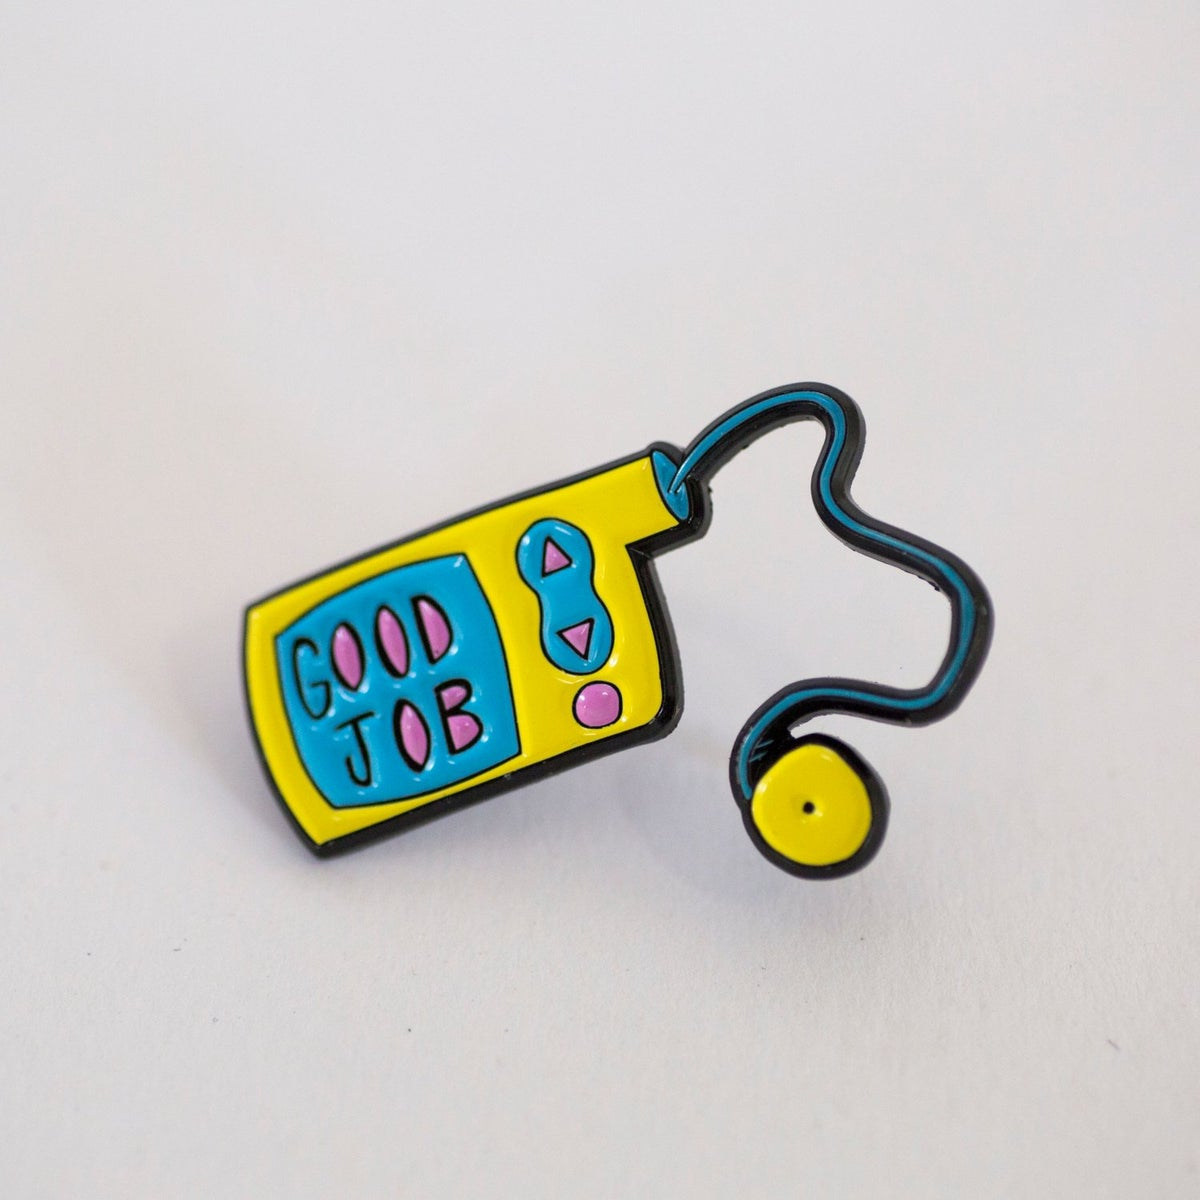 Image of Good Job Label Pin